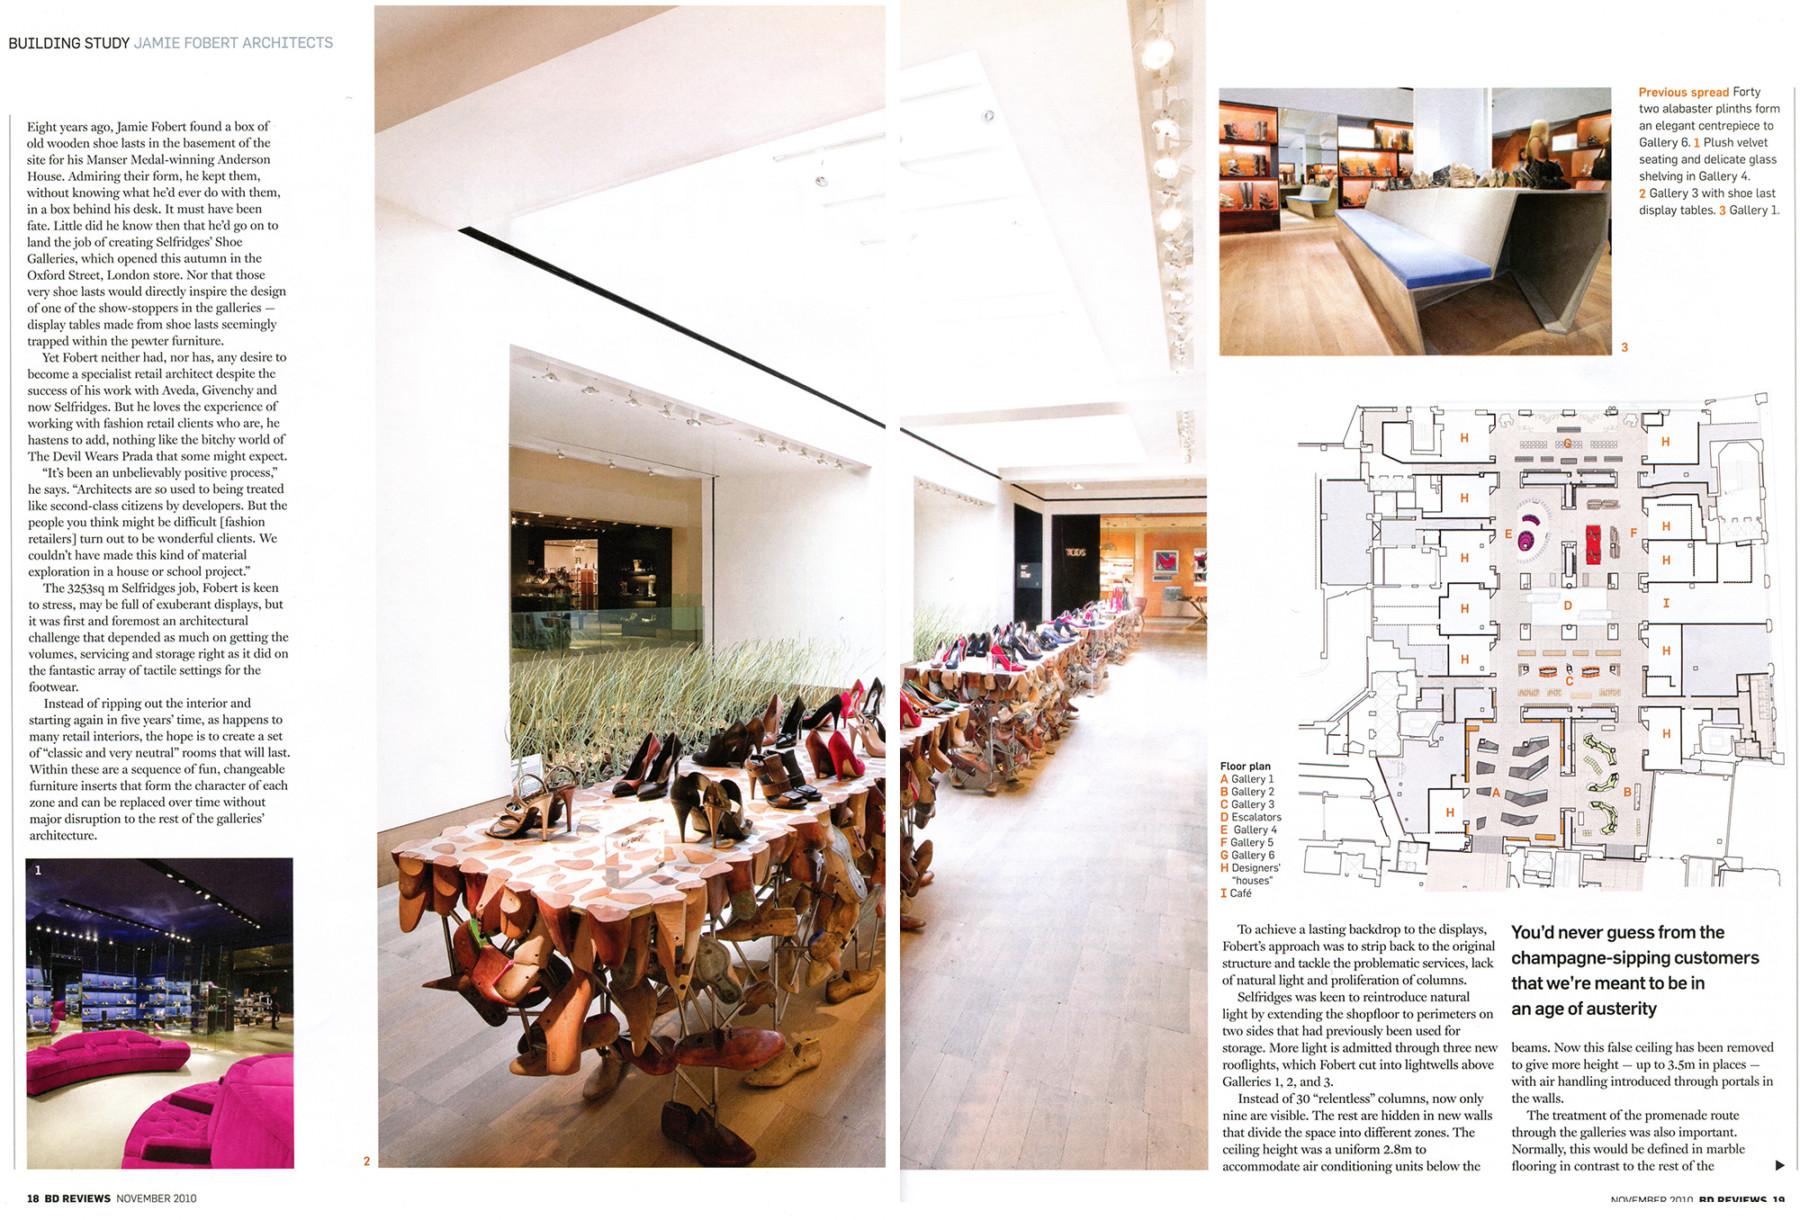 Jamie-Fobert-Architects-Selfridges-Shoes-Article-Press-BD 2